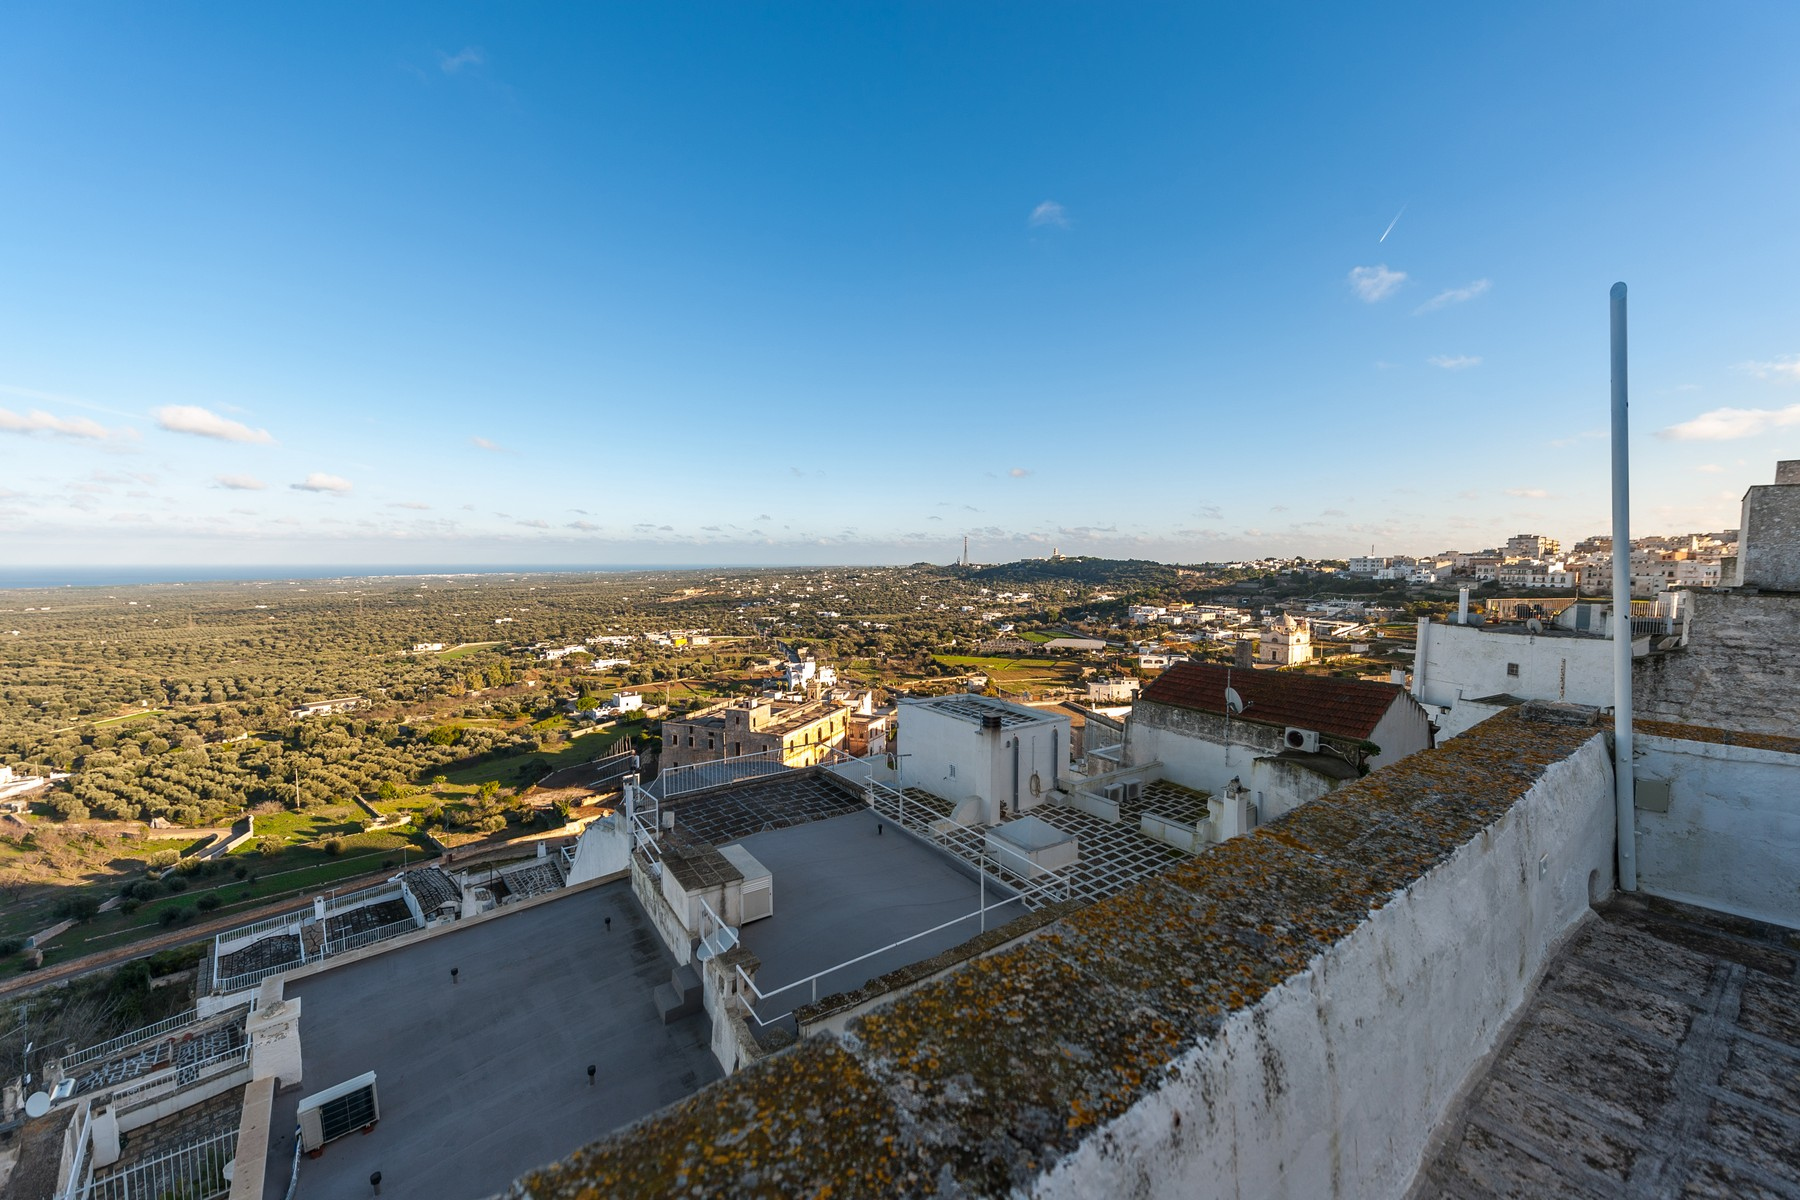 Appartamento in Vendita a Ostuni: 5 locali, 265 mq - Foto 12